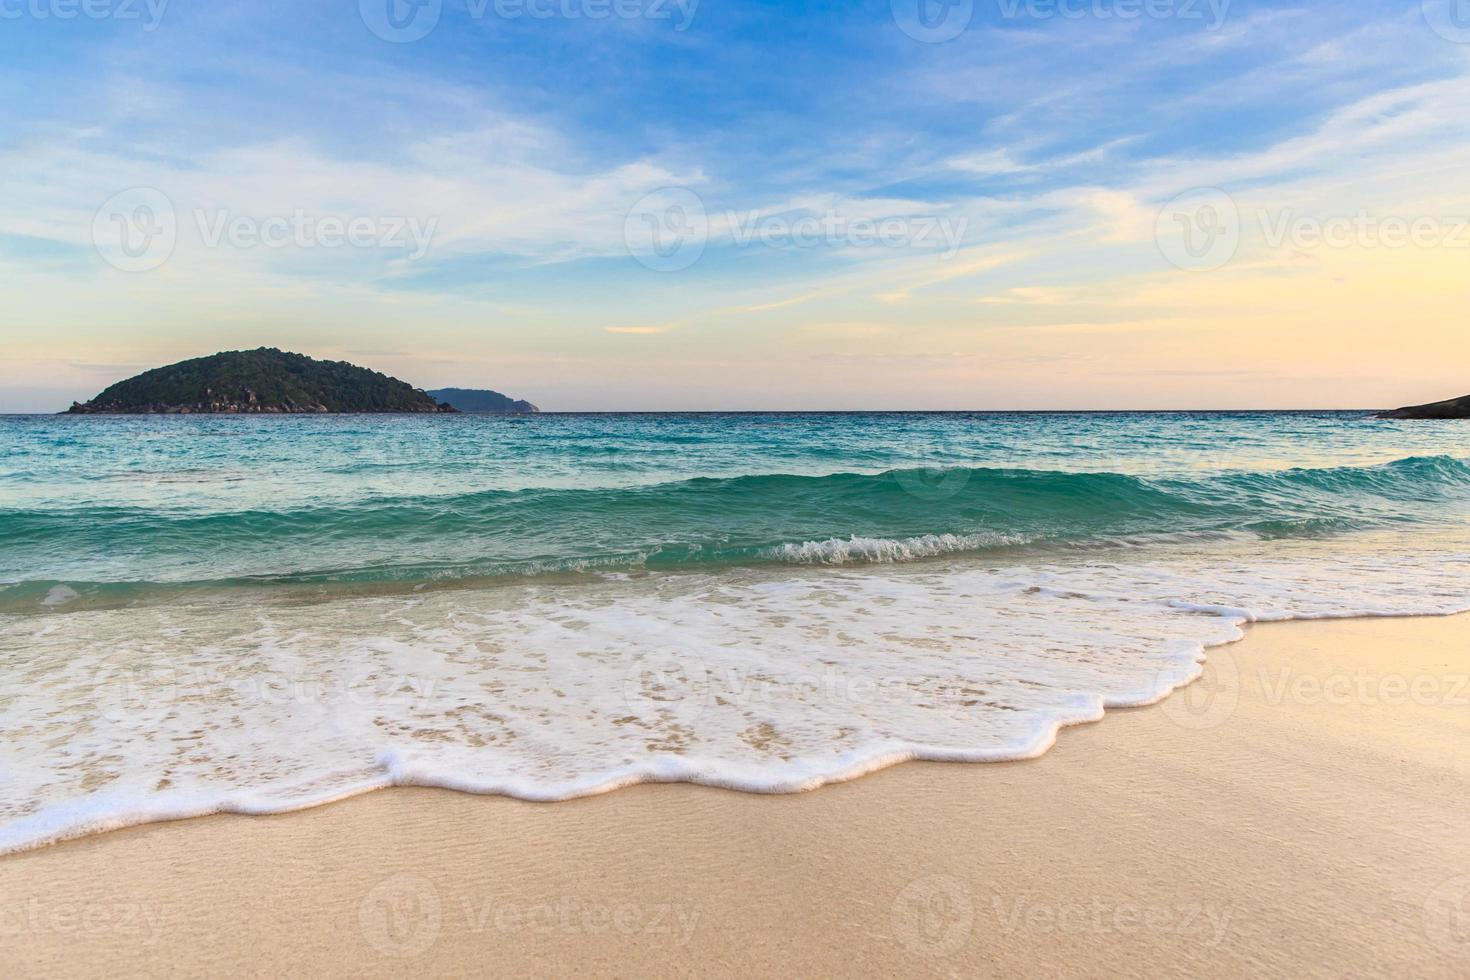 Beautiful beach and crystal clear sea at tropical island, photo